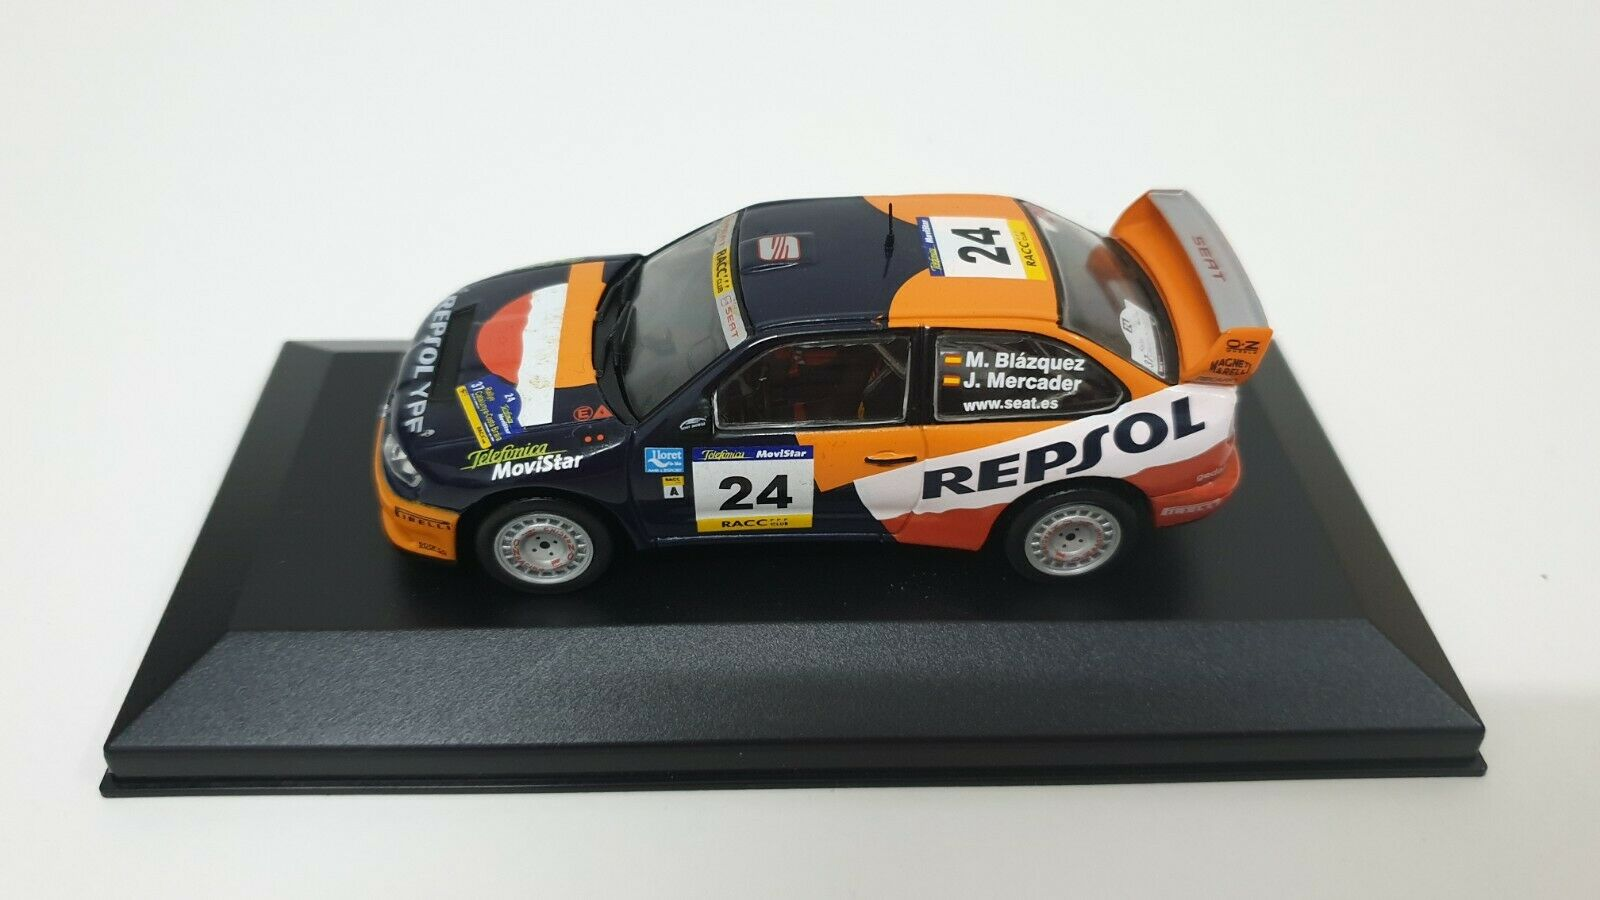 1 43 SEAT C. 65533;65533;, RDOBA WRC EVO III M. BL TRANS5533;65533;, ZQUEZ  J. MERCADER -rally CATALUNYA 2001